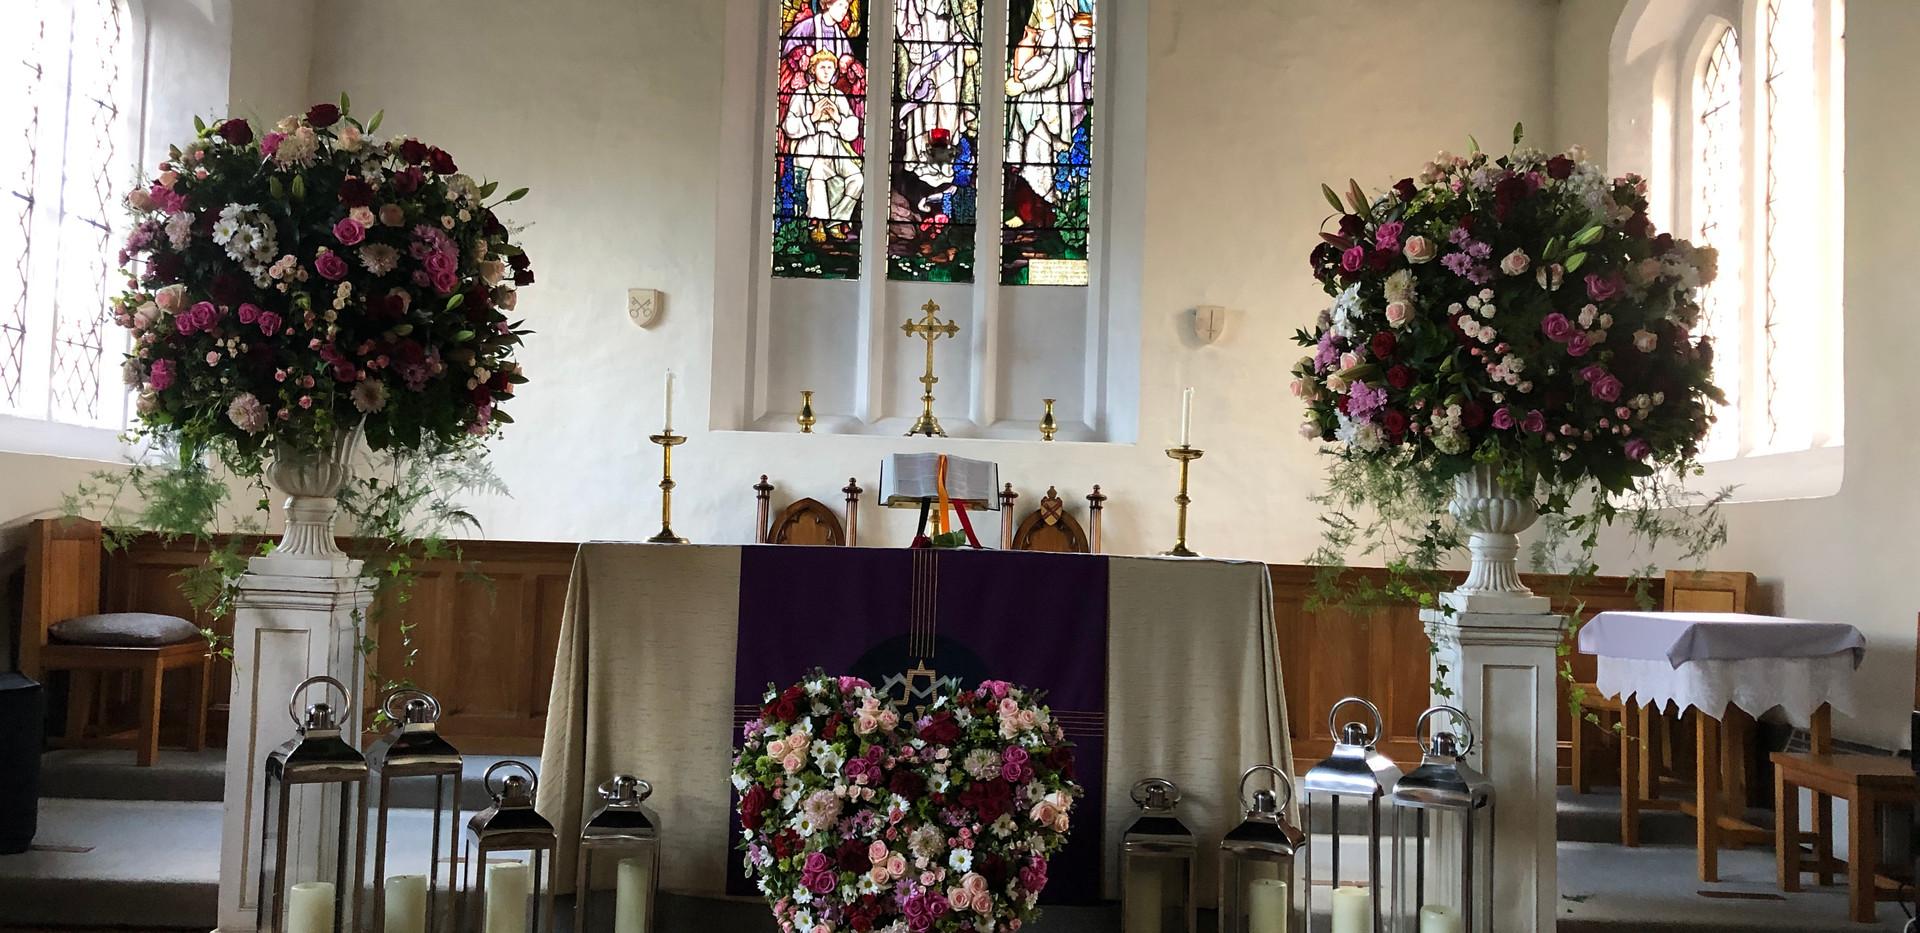 RIP Funeral Memorial Flowers by T.J.